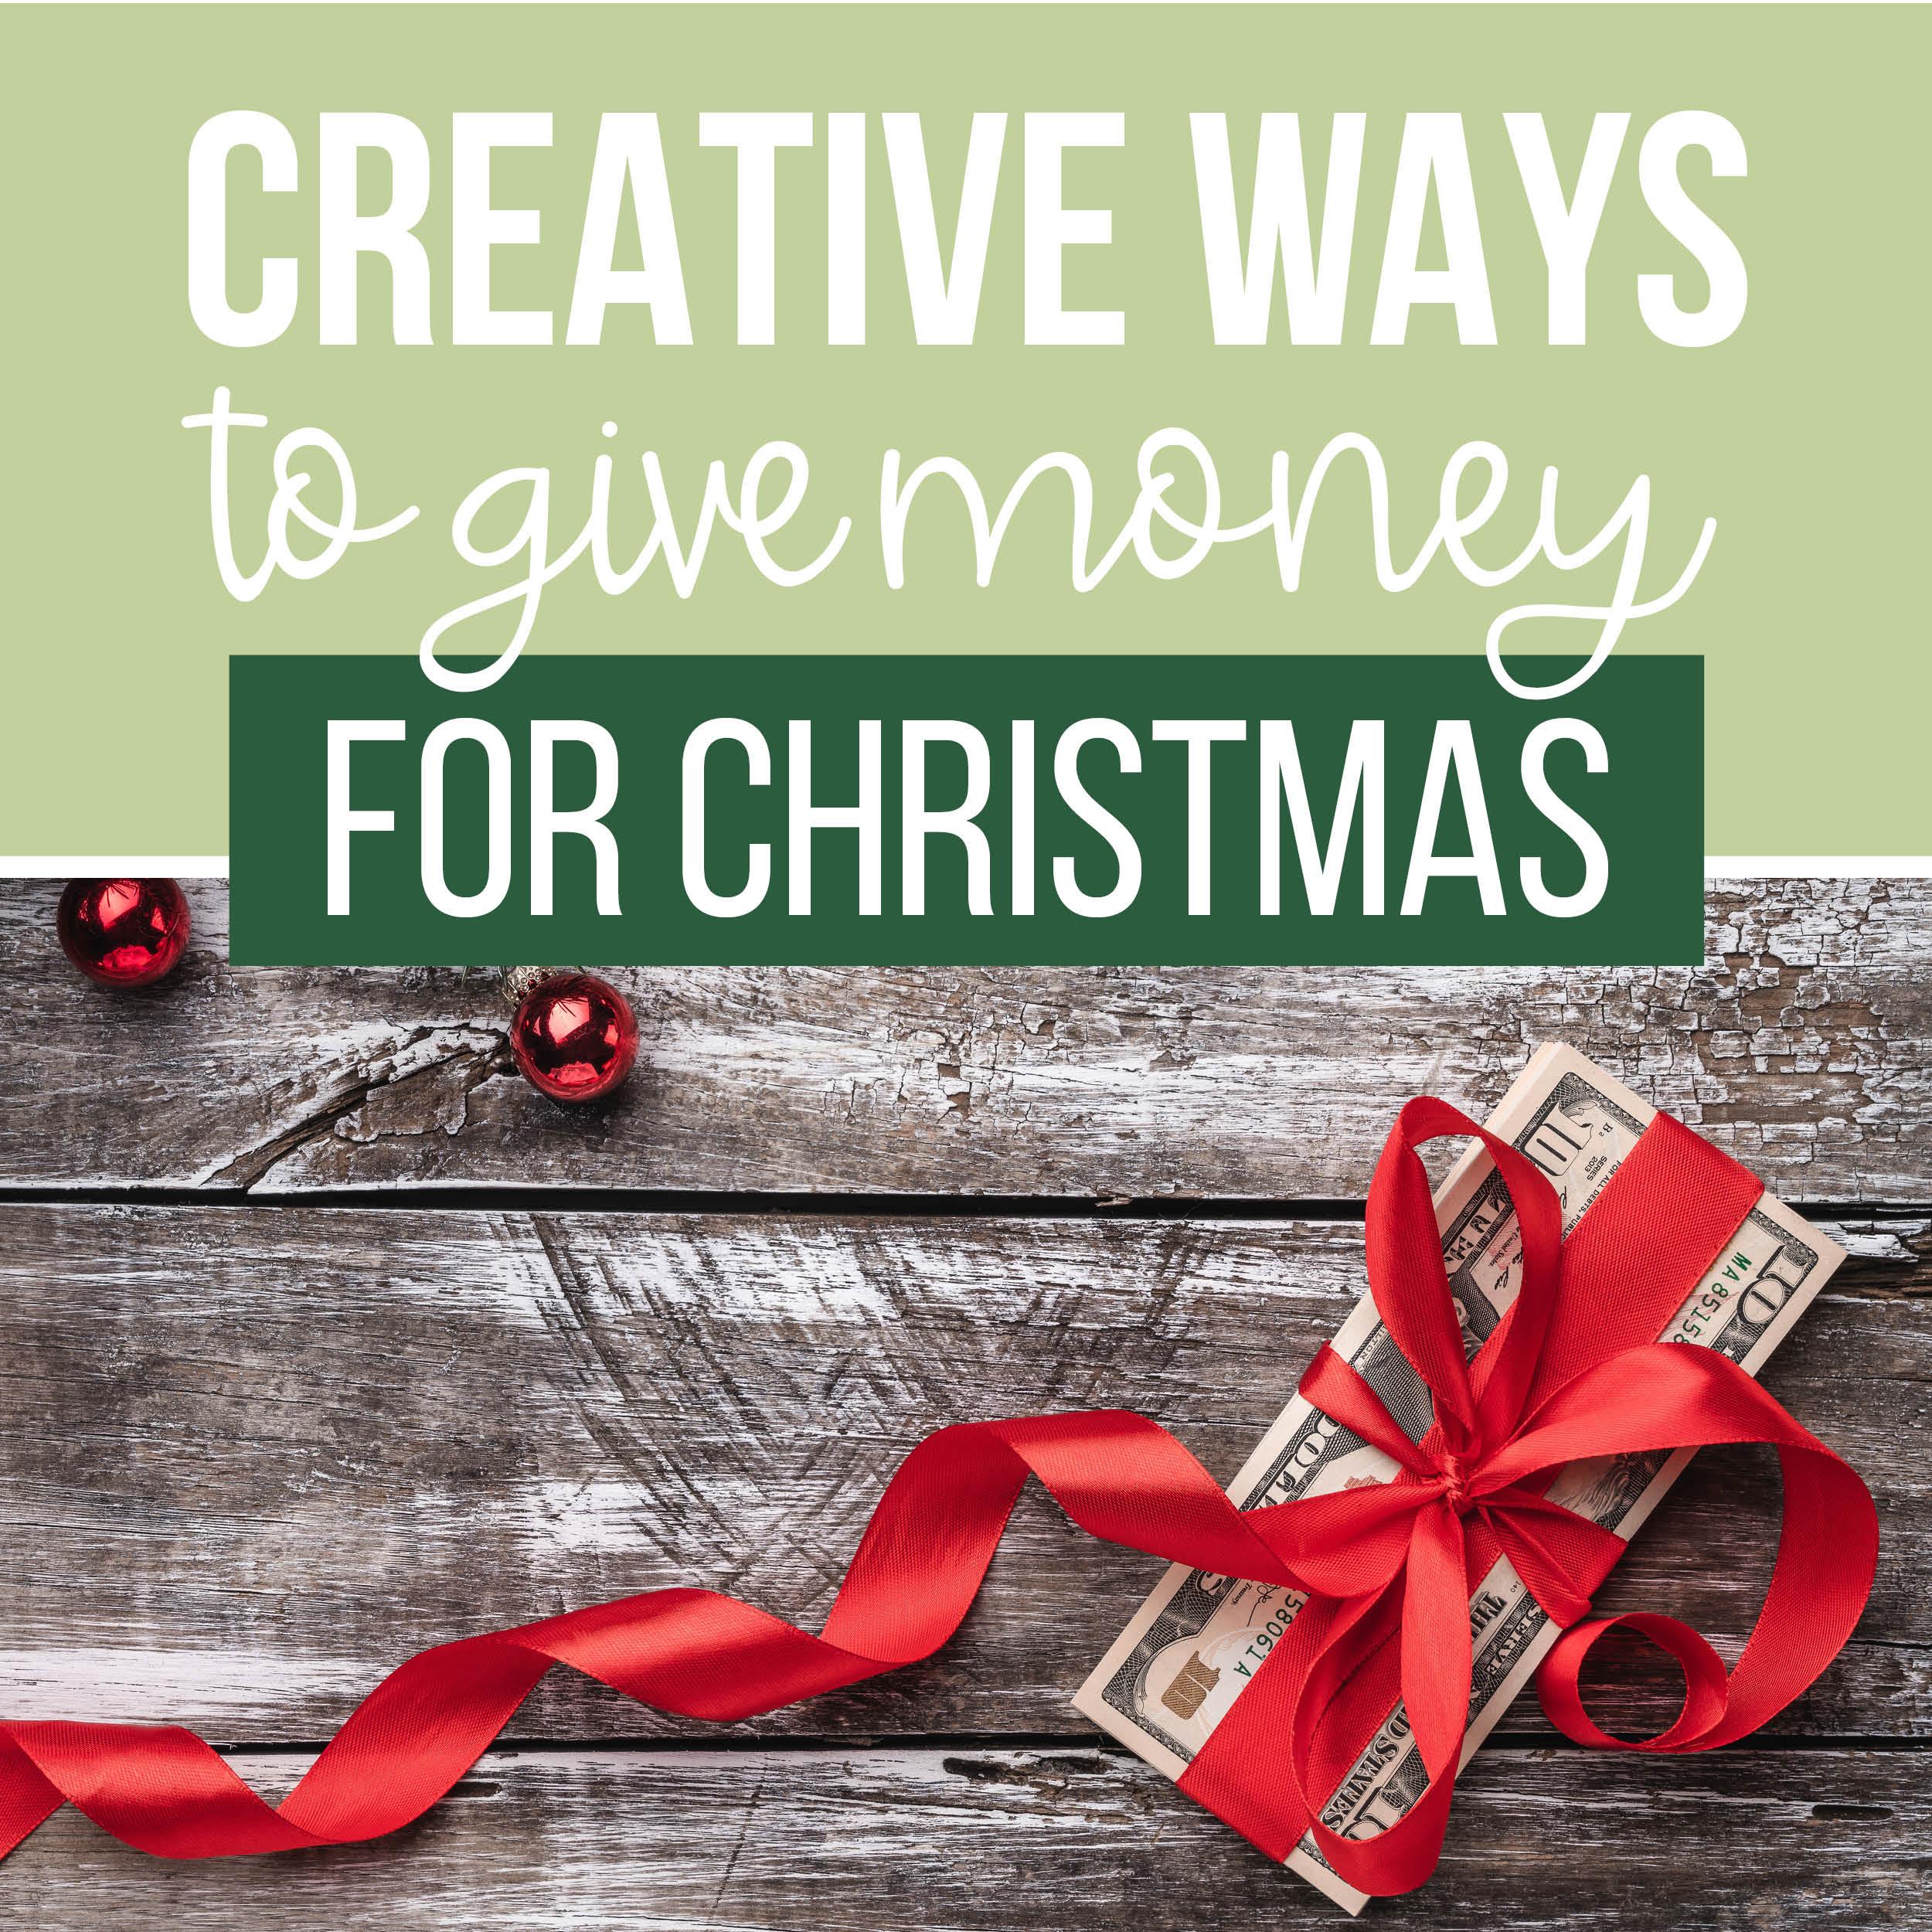 Money Gift Ideas For Christmas The Dating Divas